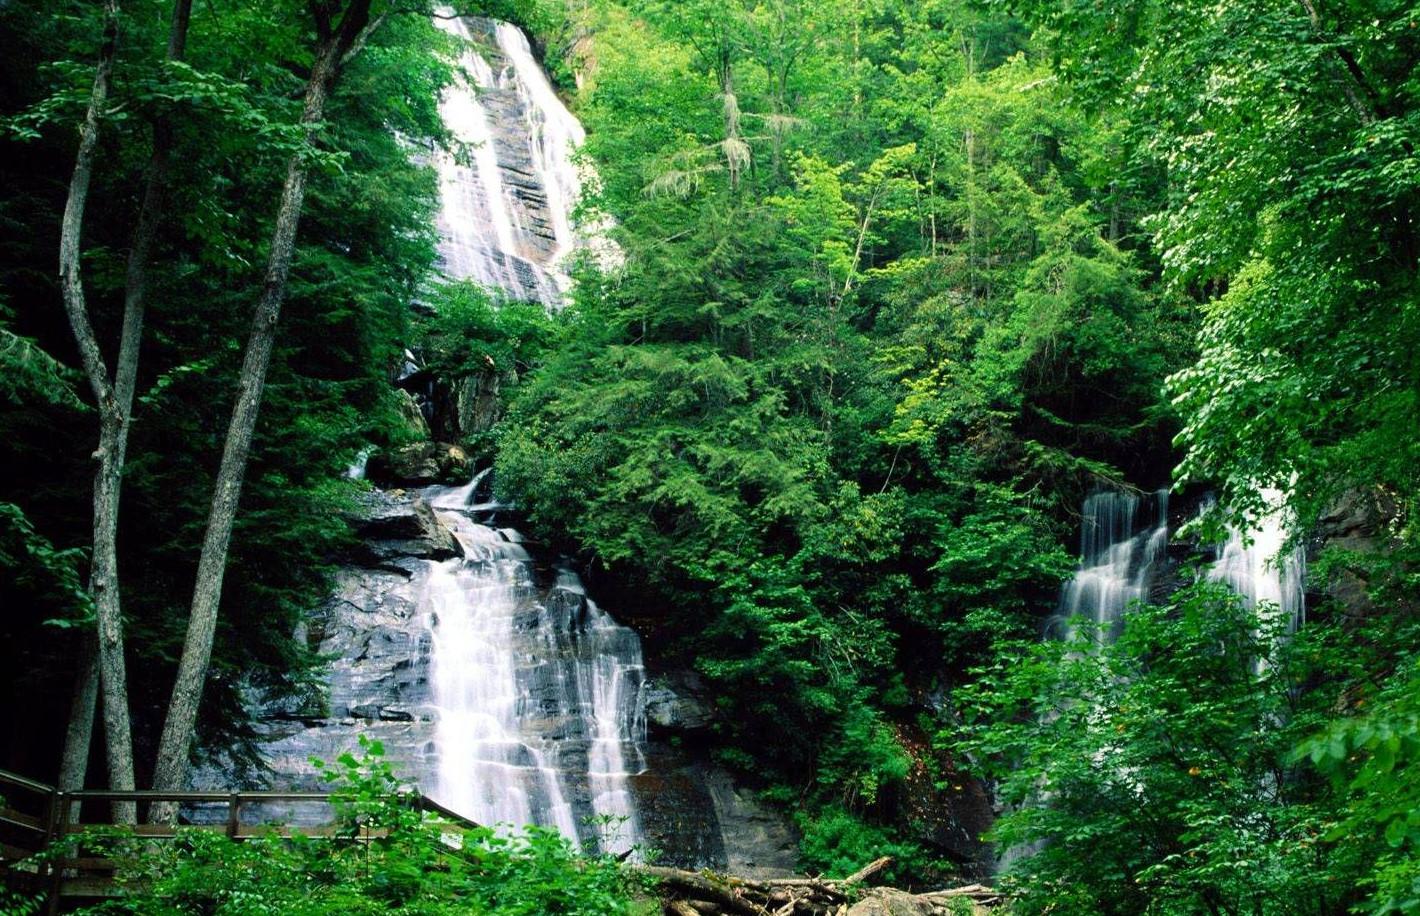 Chattahoochee Oconee National Forests